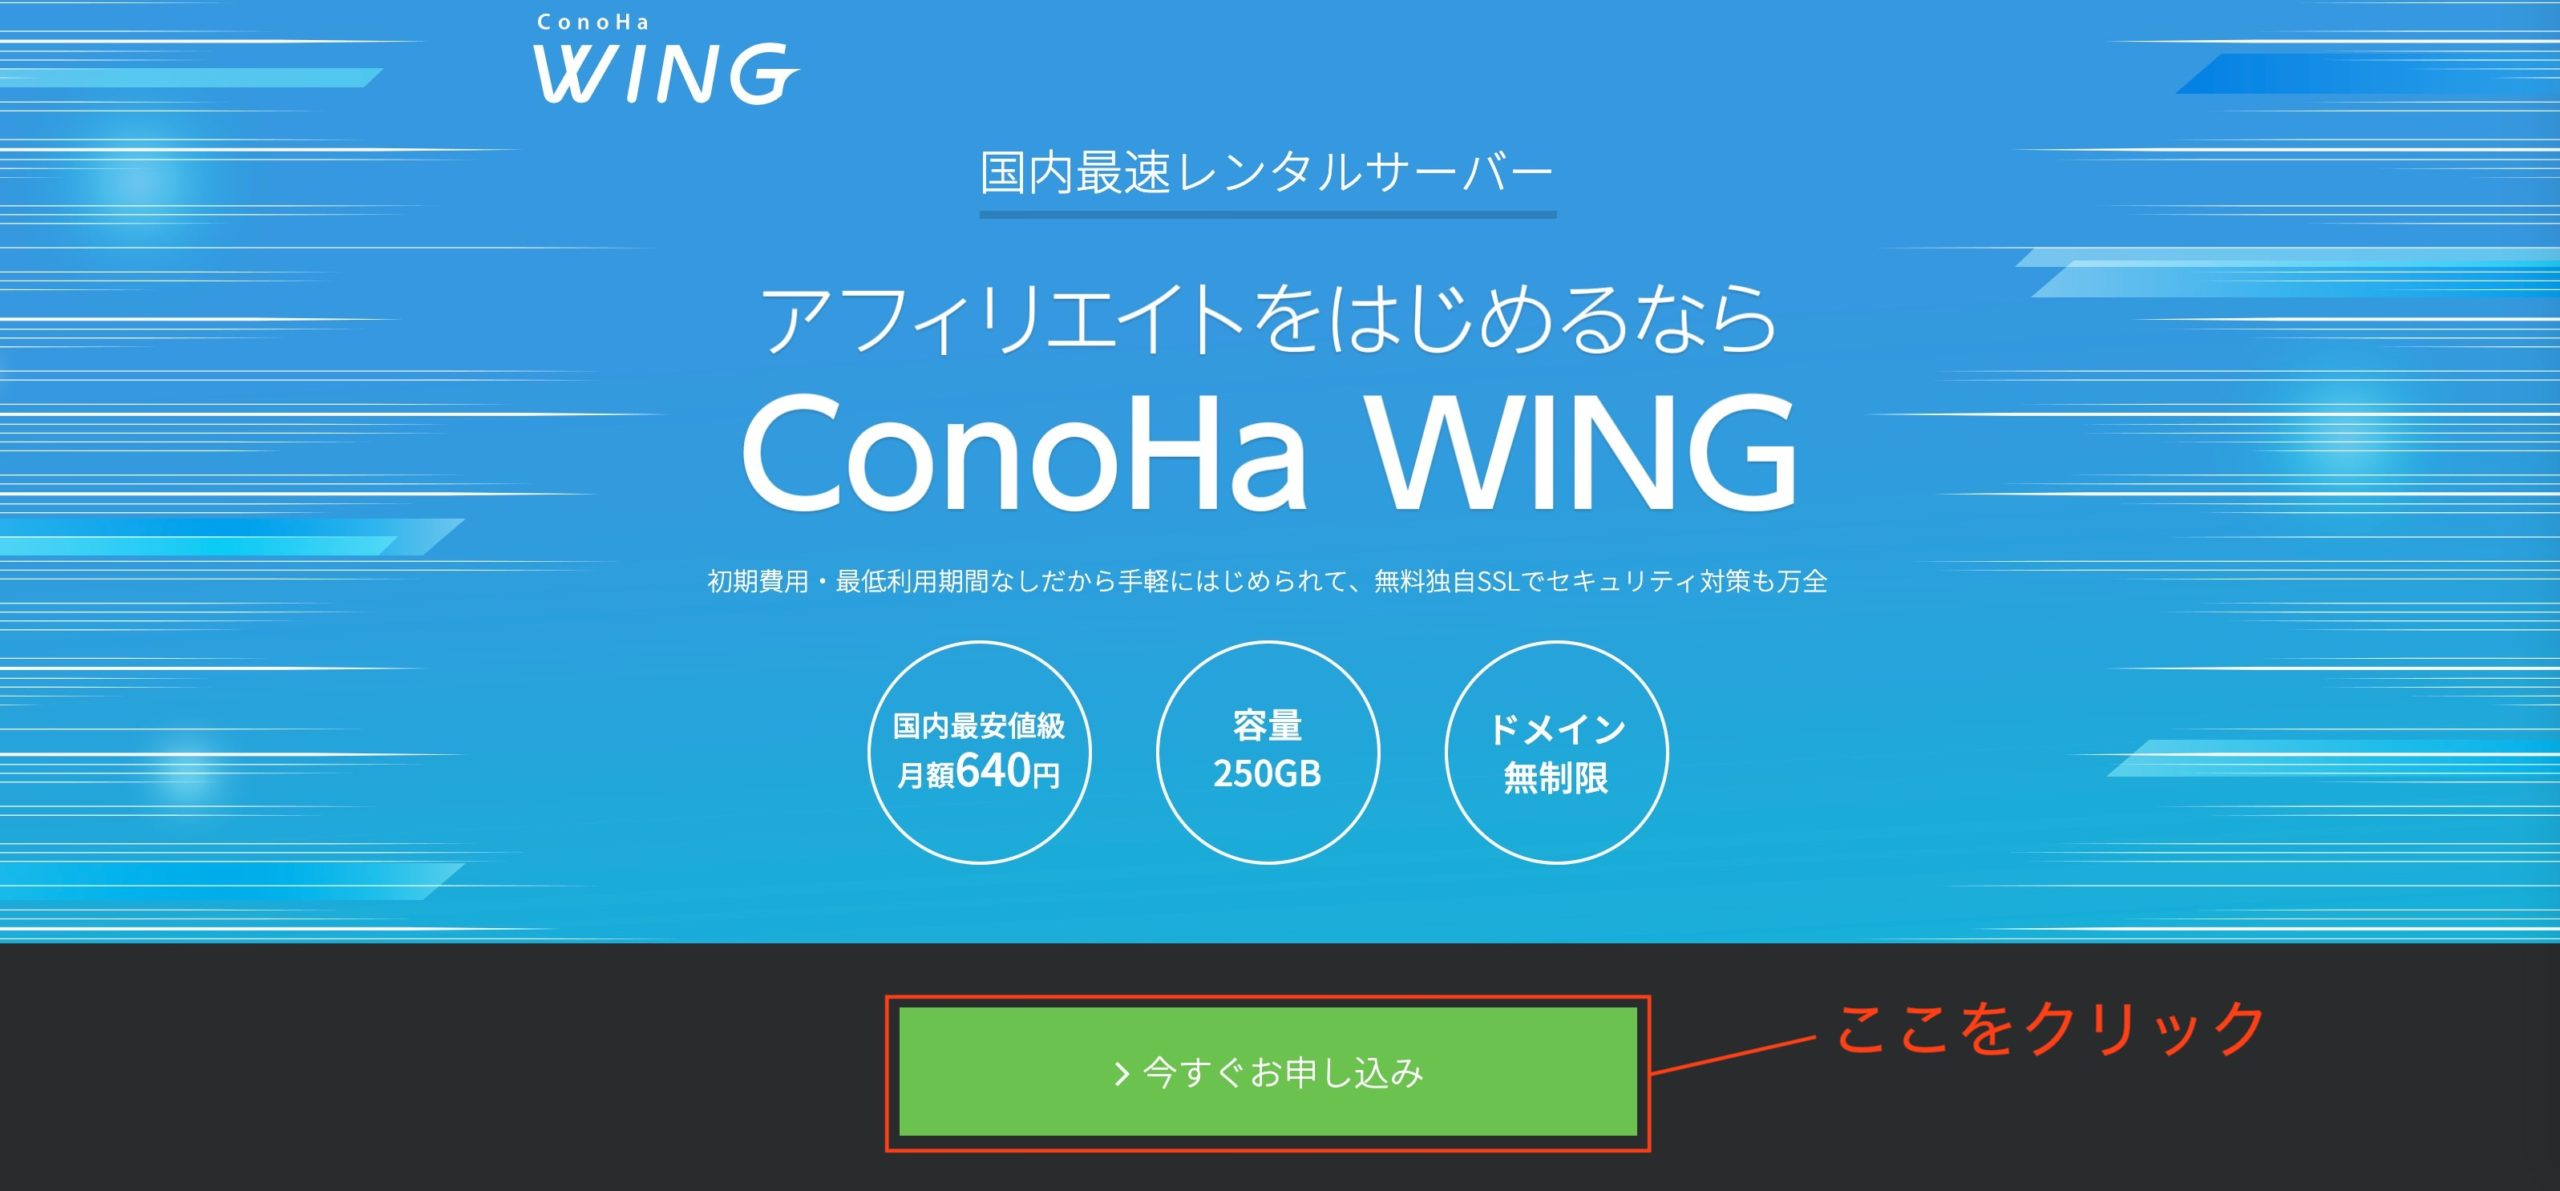 ConoHa WINGのトップページ